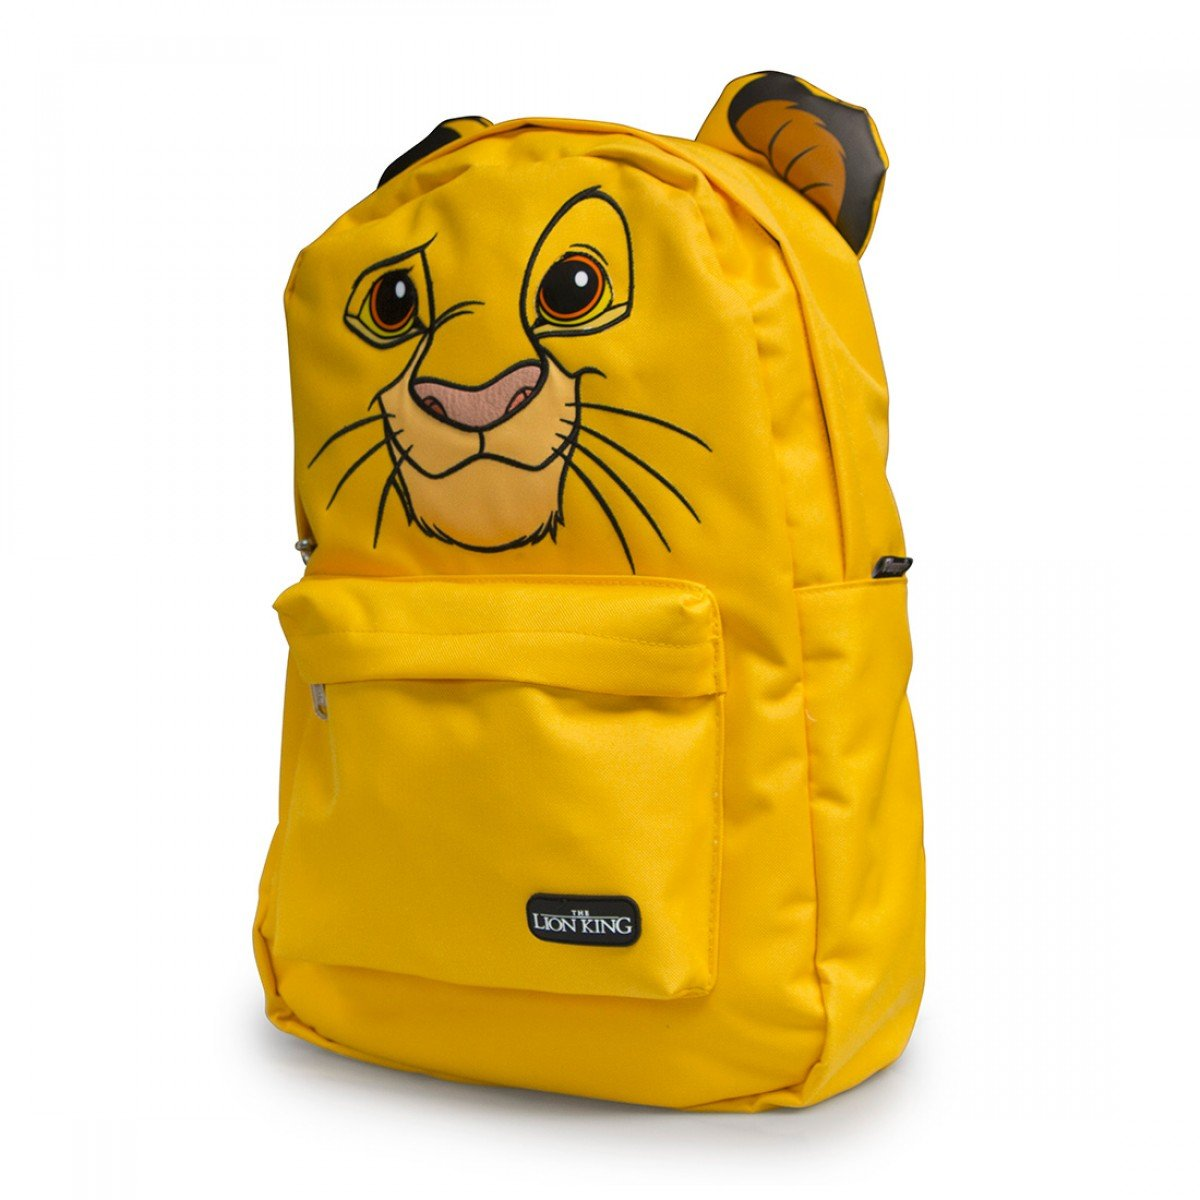 397e13f27f33 Amazon.com  Disney Simba Lion King Nylon Backpack and Pencil Case Set by  Loungefly  Clothing